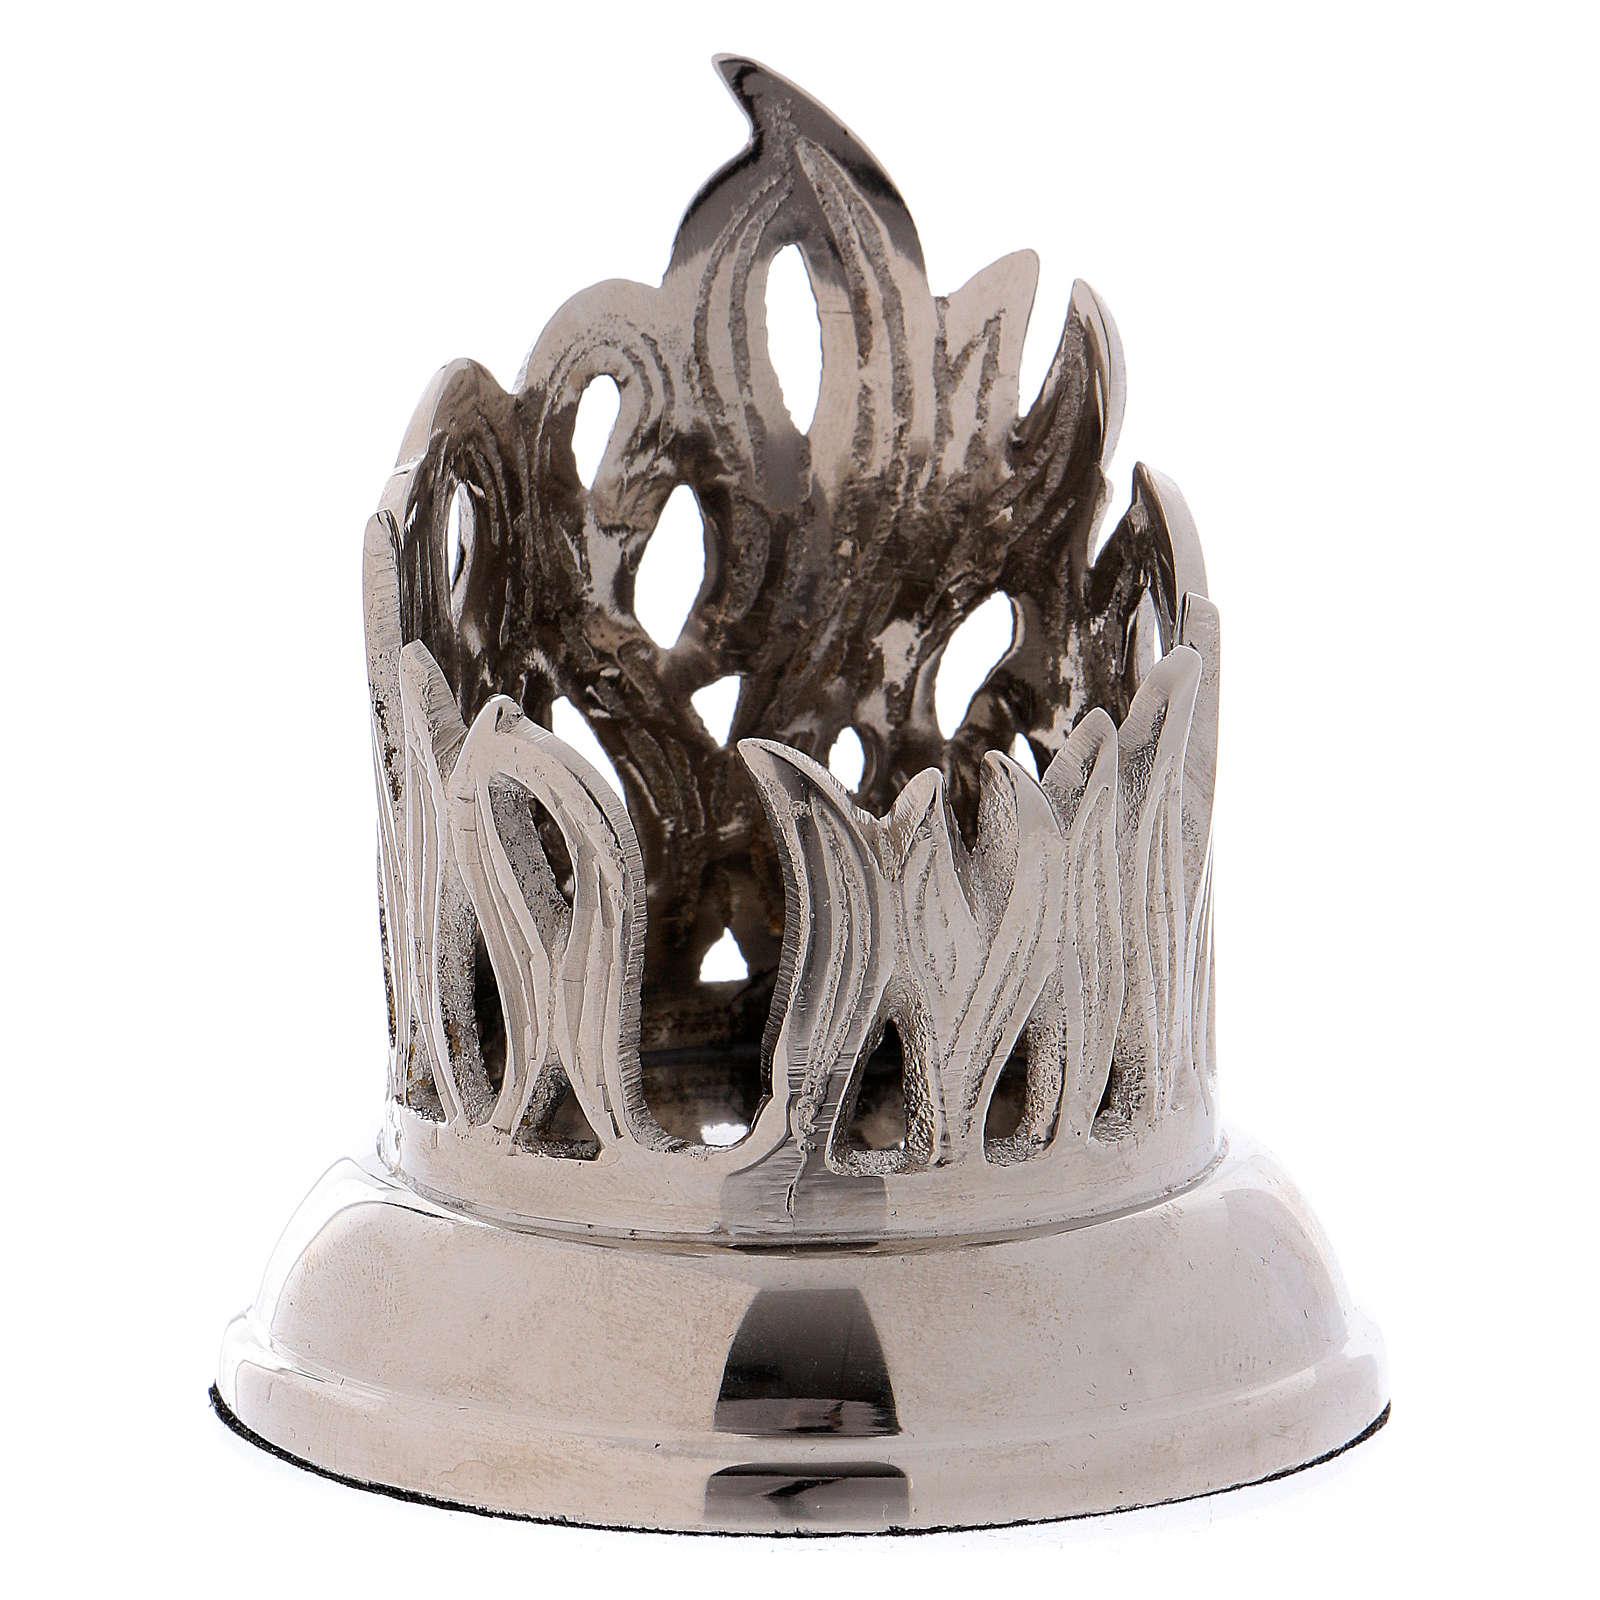 Portacandele fiamma ottone argentato 4 cm  4